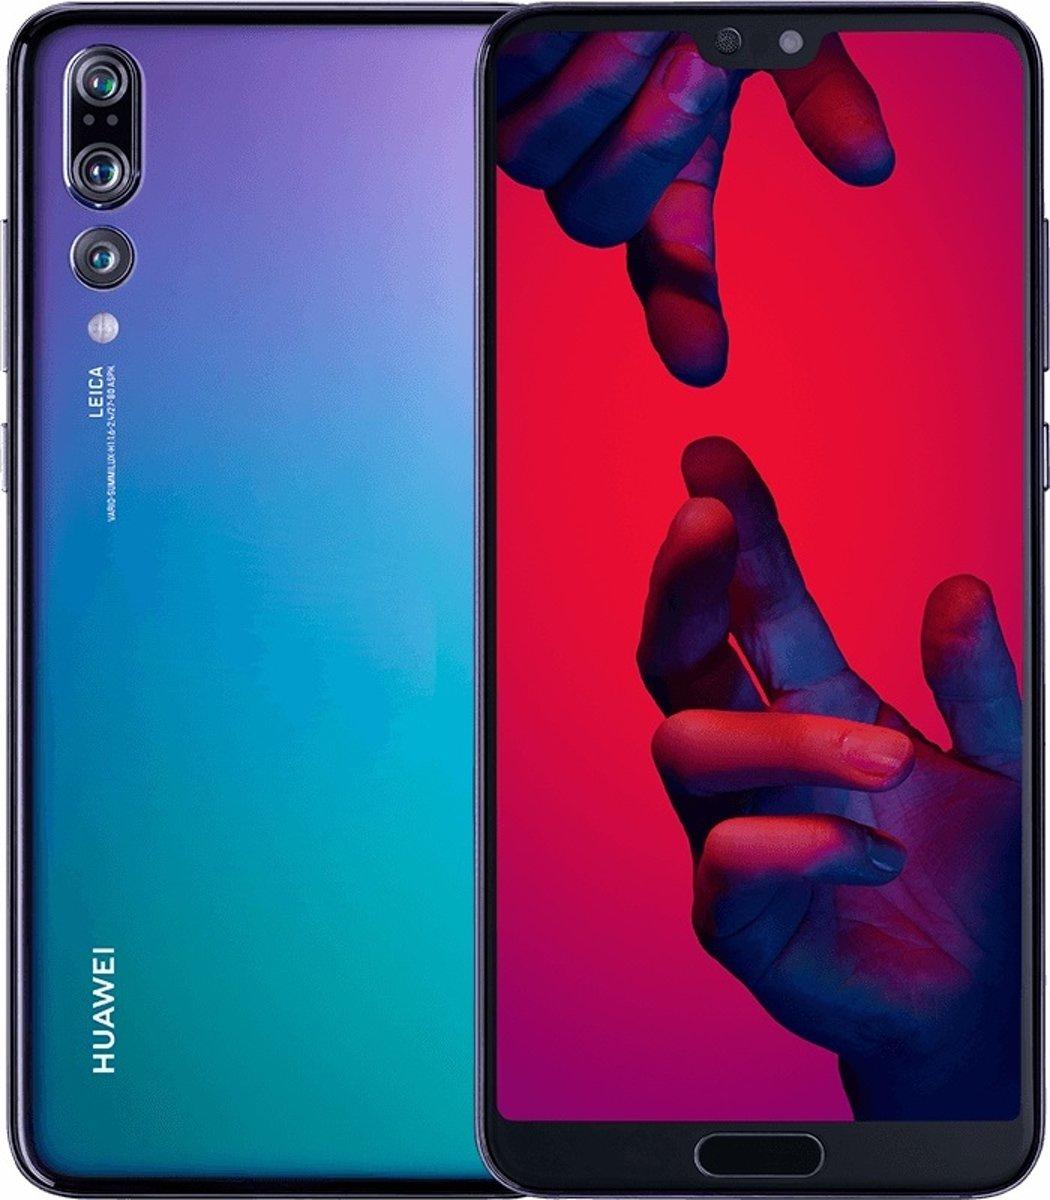 Huawei P20 Pro 15,5 cm (6.1'') 6 GB 128 GB Single SIM Multi kleuren 4000 mAh kopen